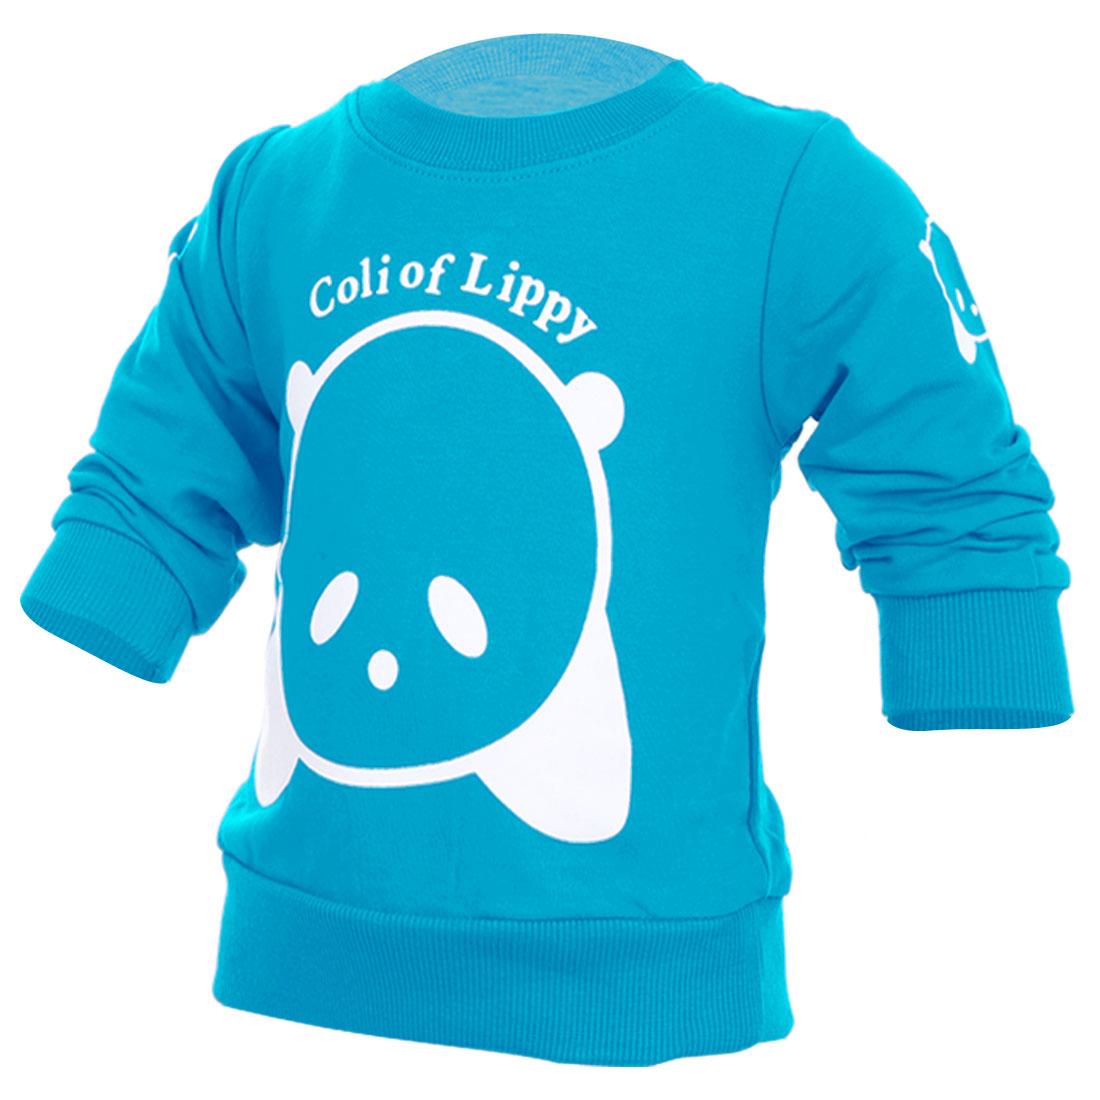 Kids Fashion NEW Long Sleeve Soft Sweatshirt Turquoise 2T